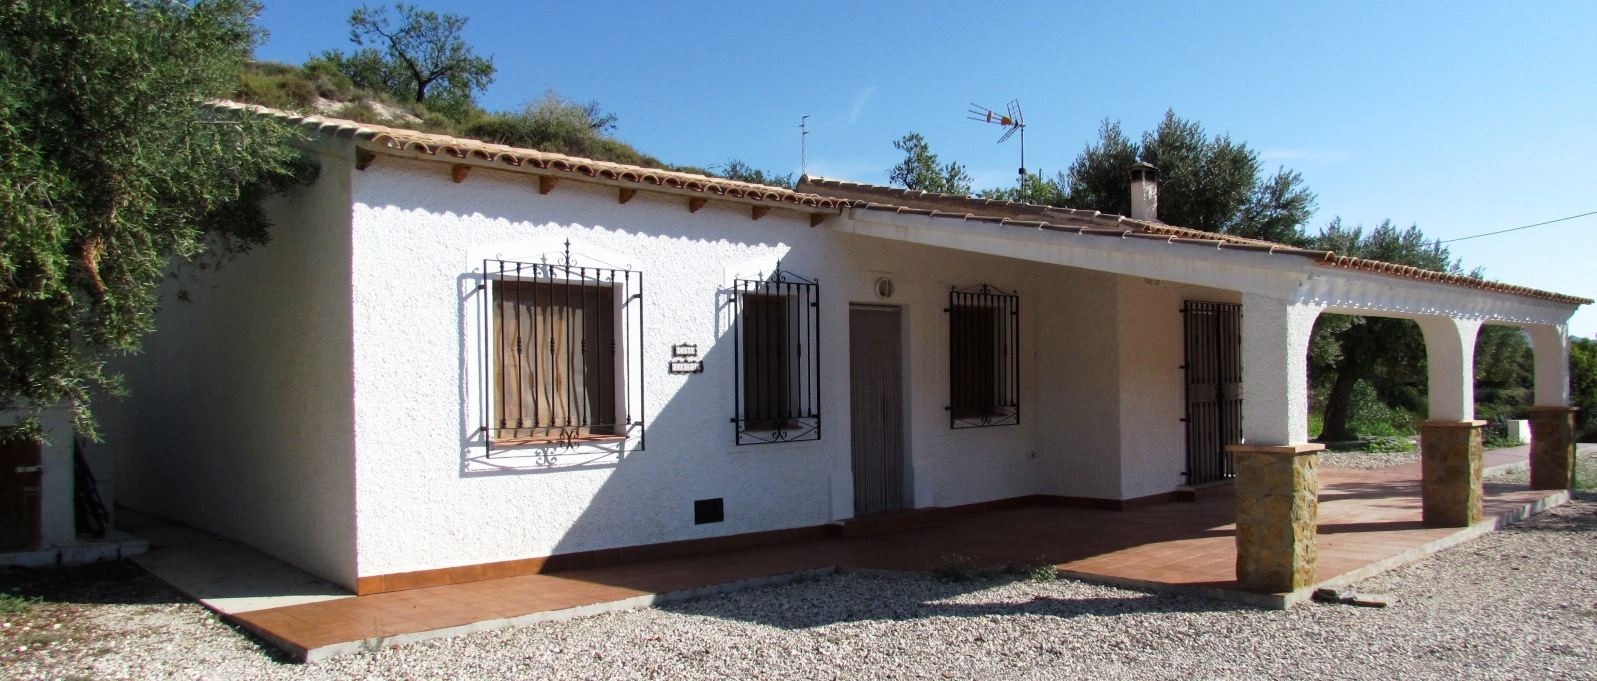 Casa Daropdi